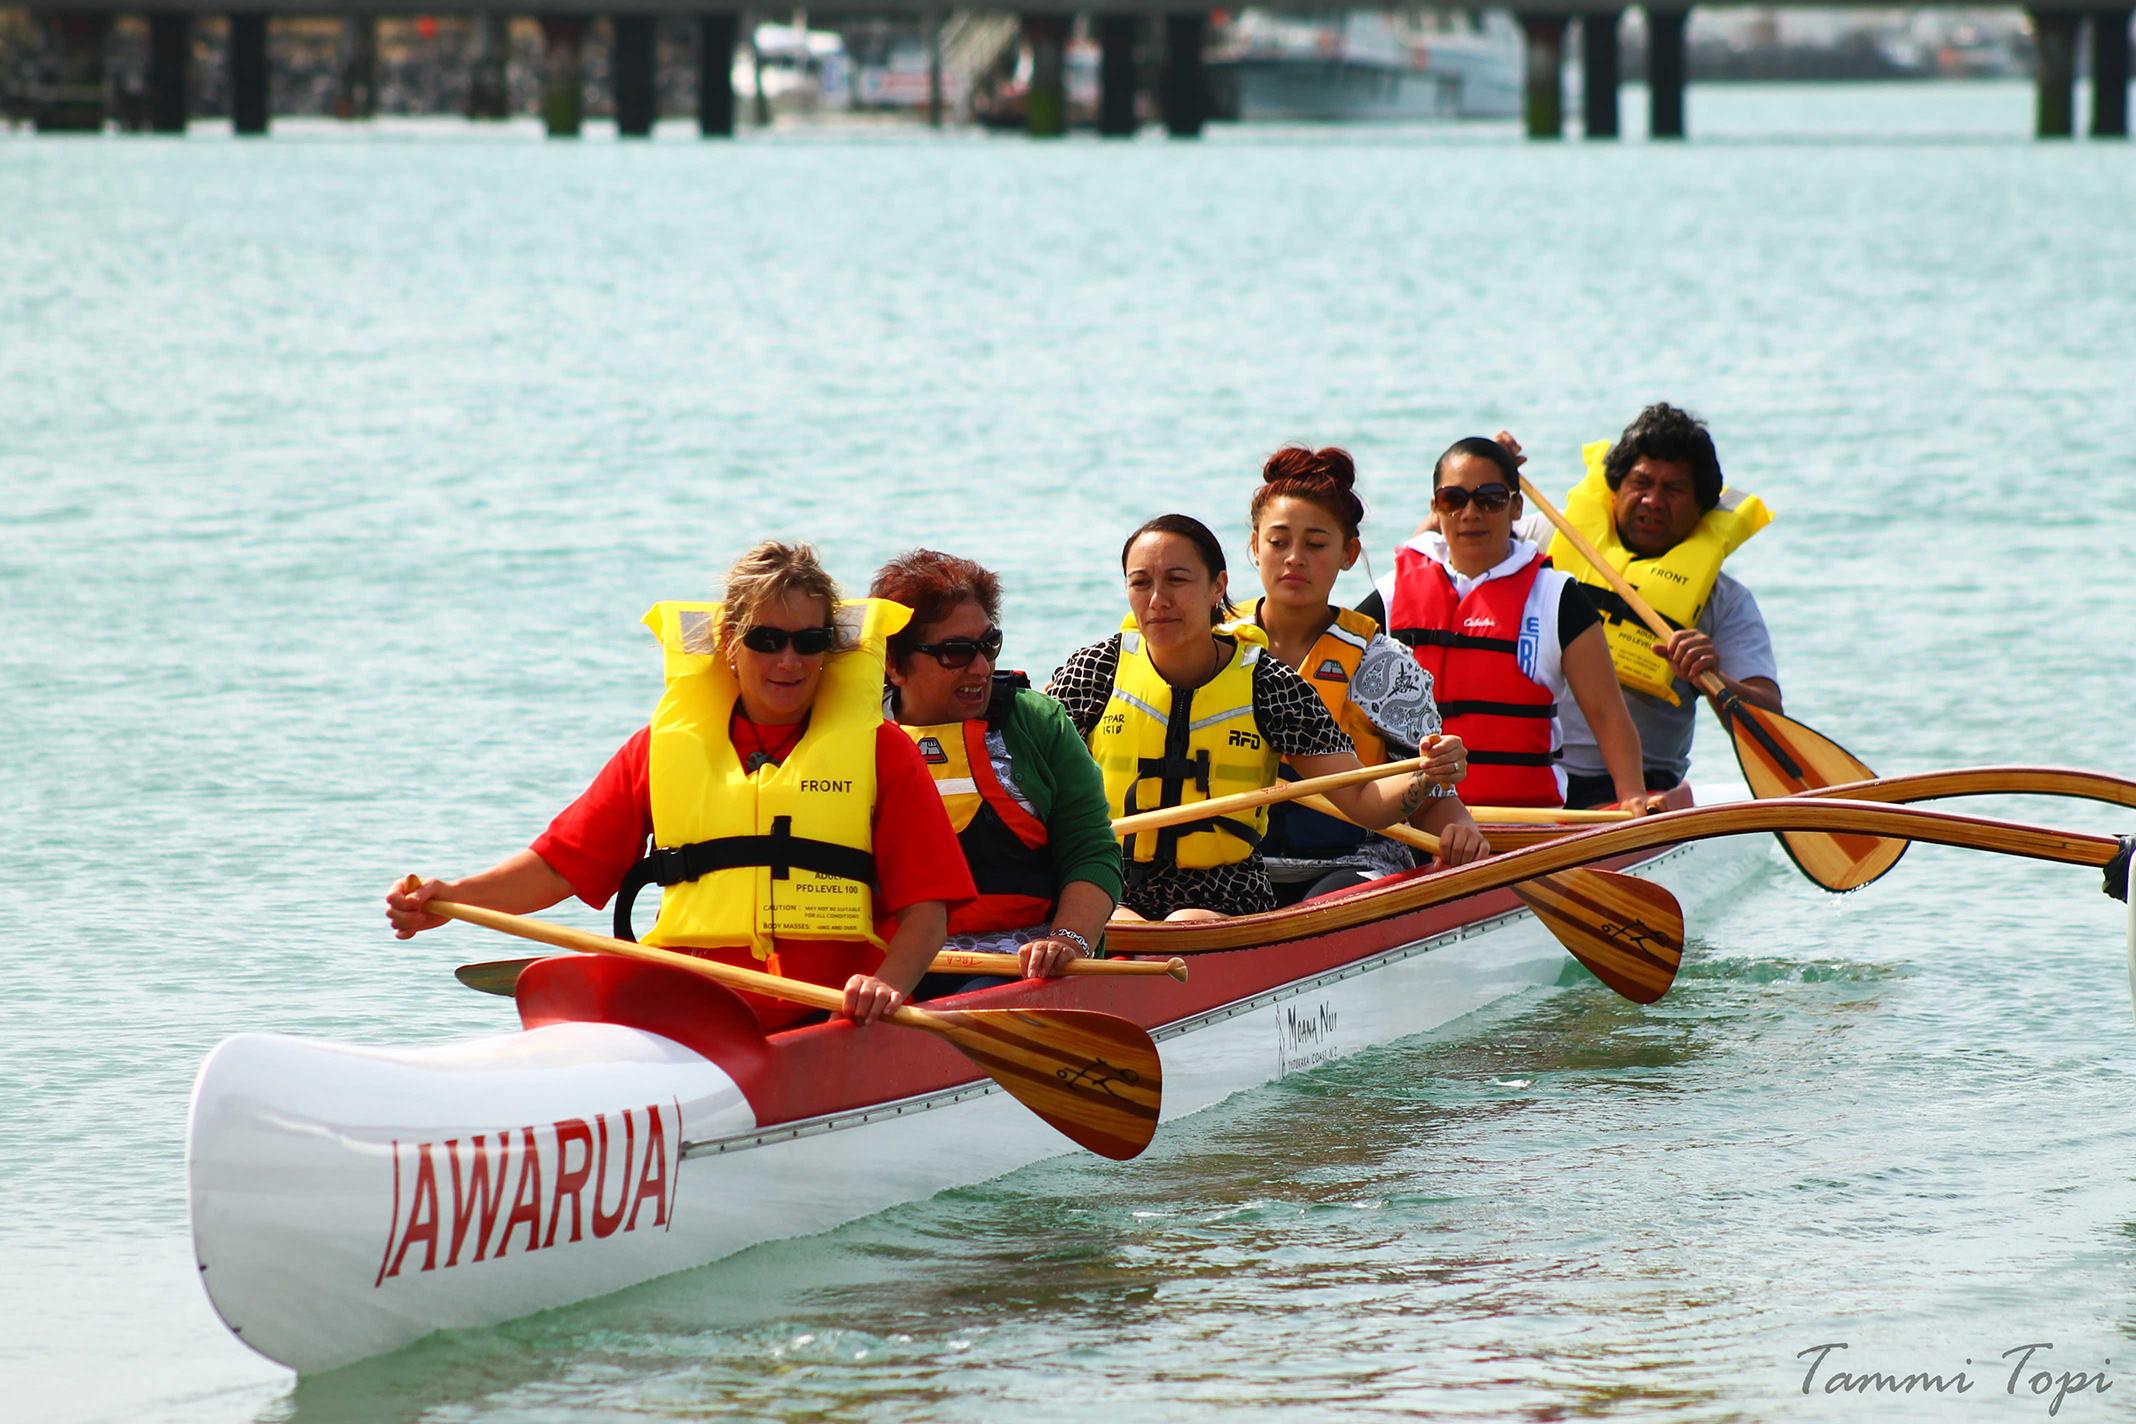 000Whānau on-board the waka ama, Awarua.